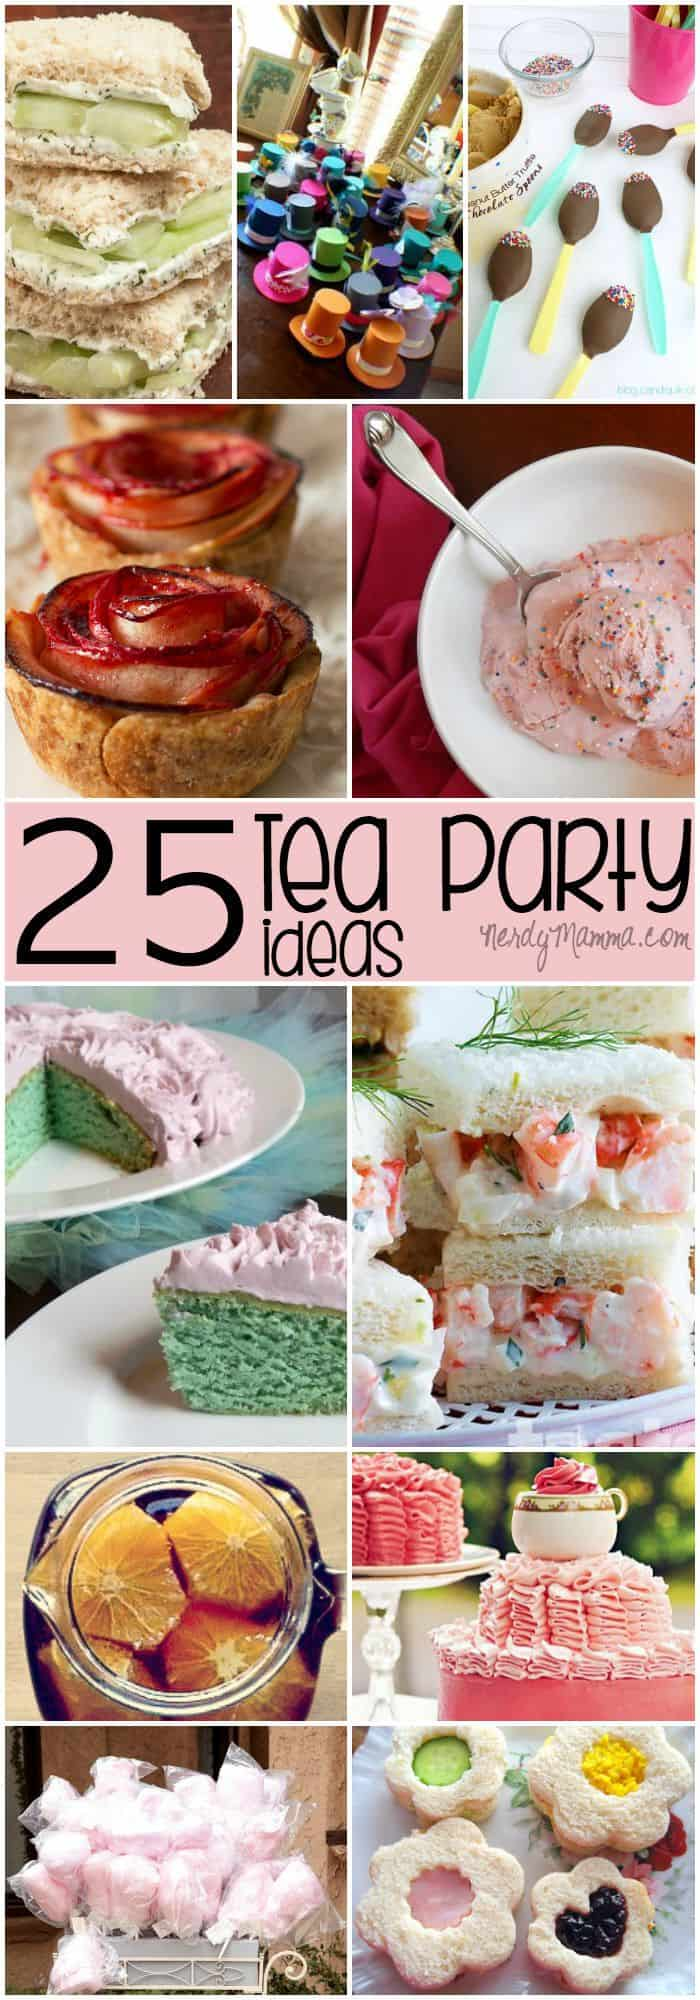 I love these 25 Tea Party Ideas for a little girl's birthday! So cute!